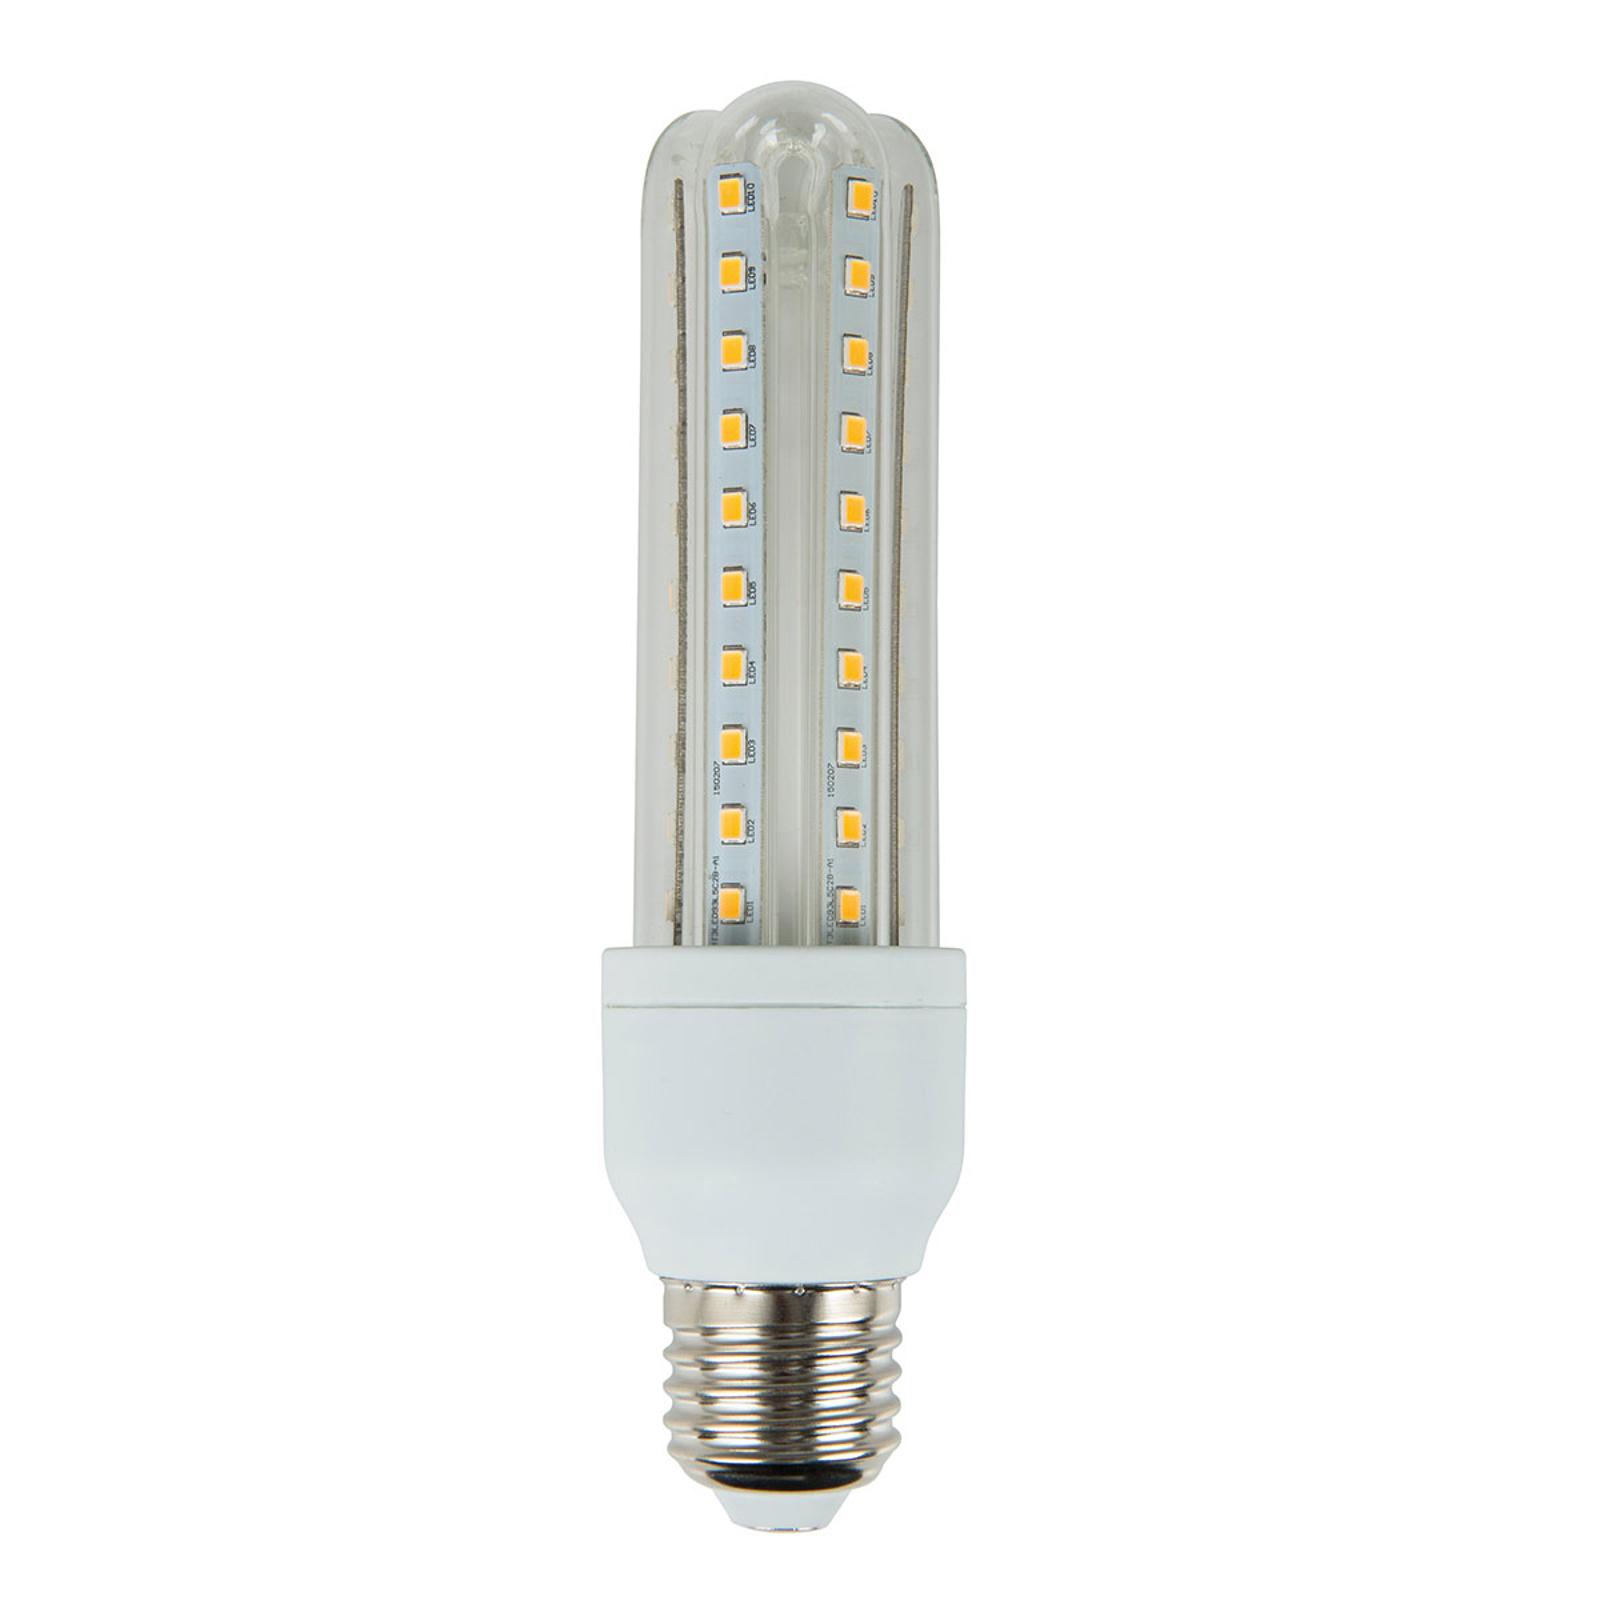 E27 LED 12 W 3U-Form 3.000 K nicht dimmbar